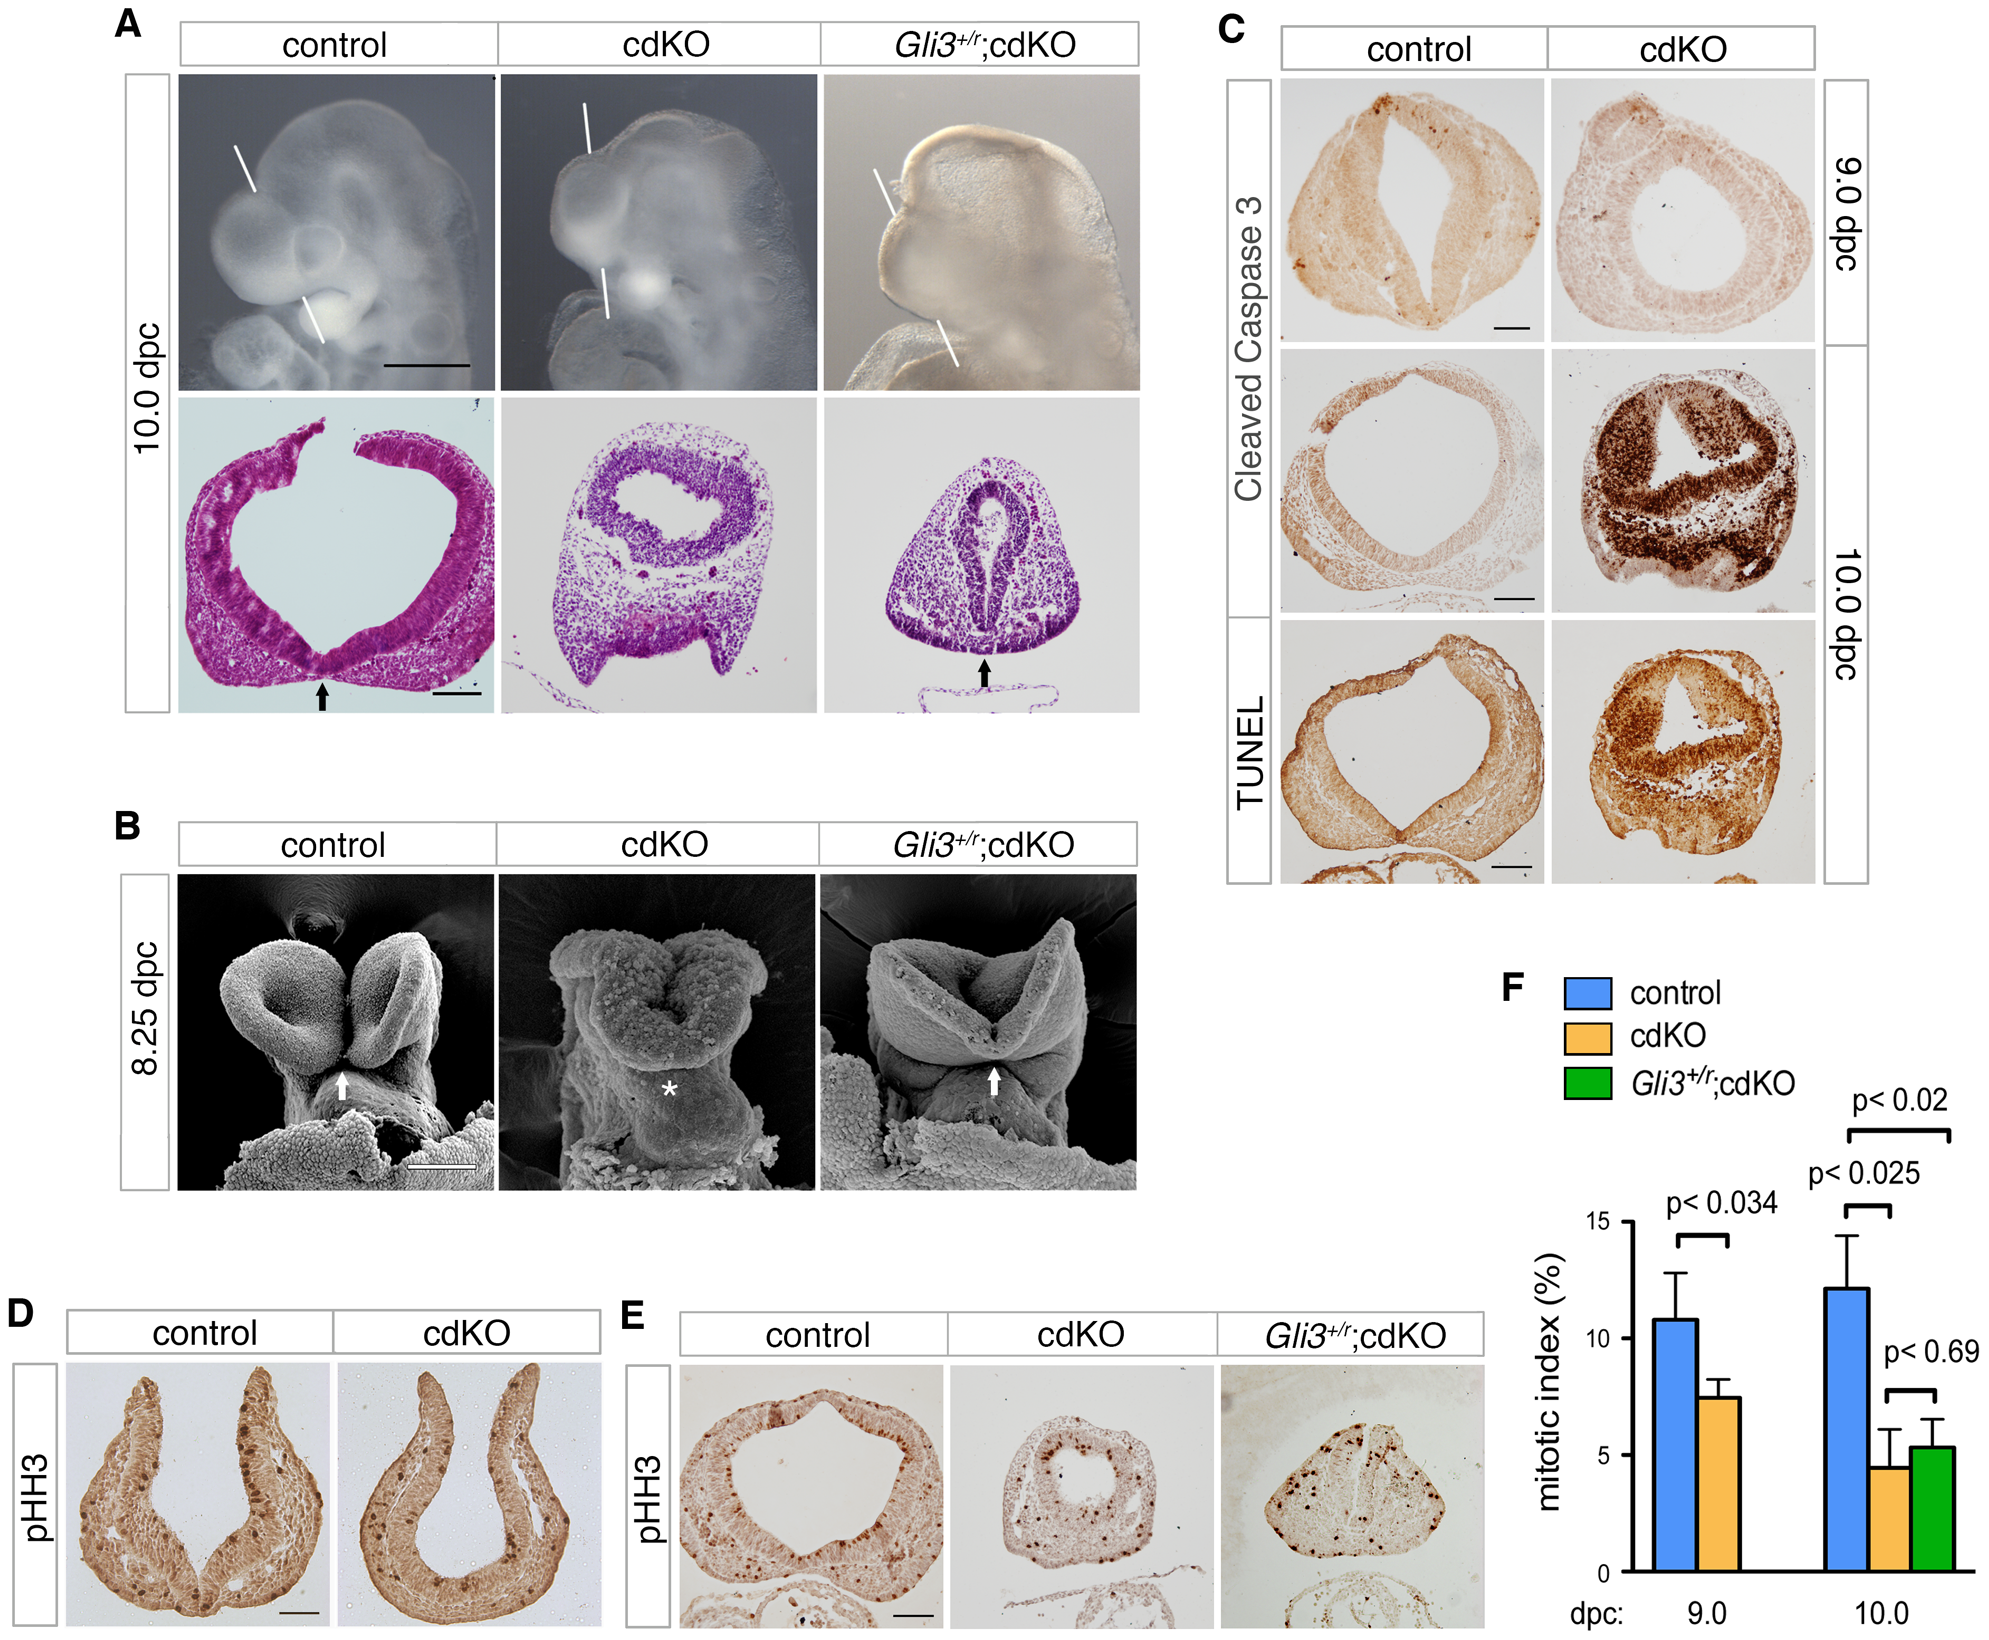 Rescued ventral forebrain structure in <i>Gli3</i> mutant cdKO embryos.